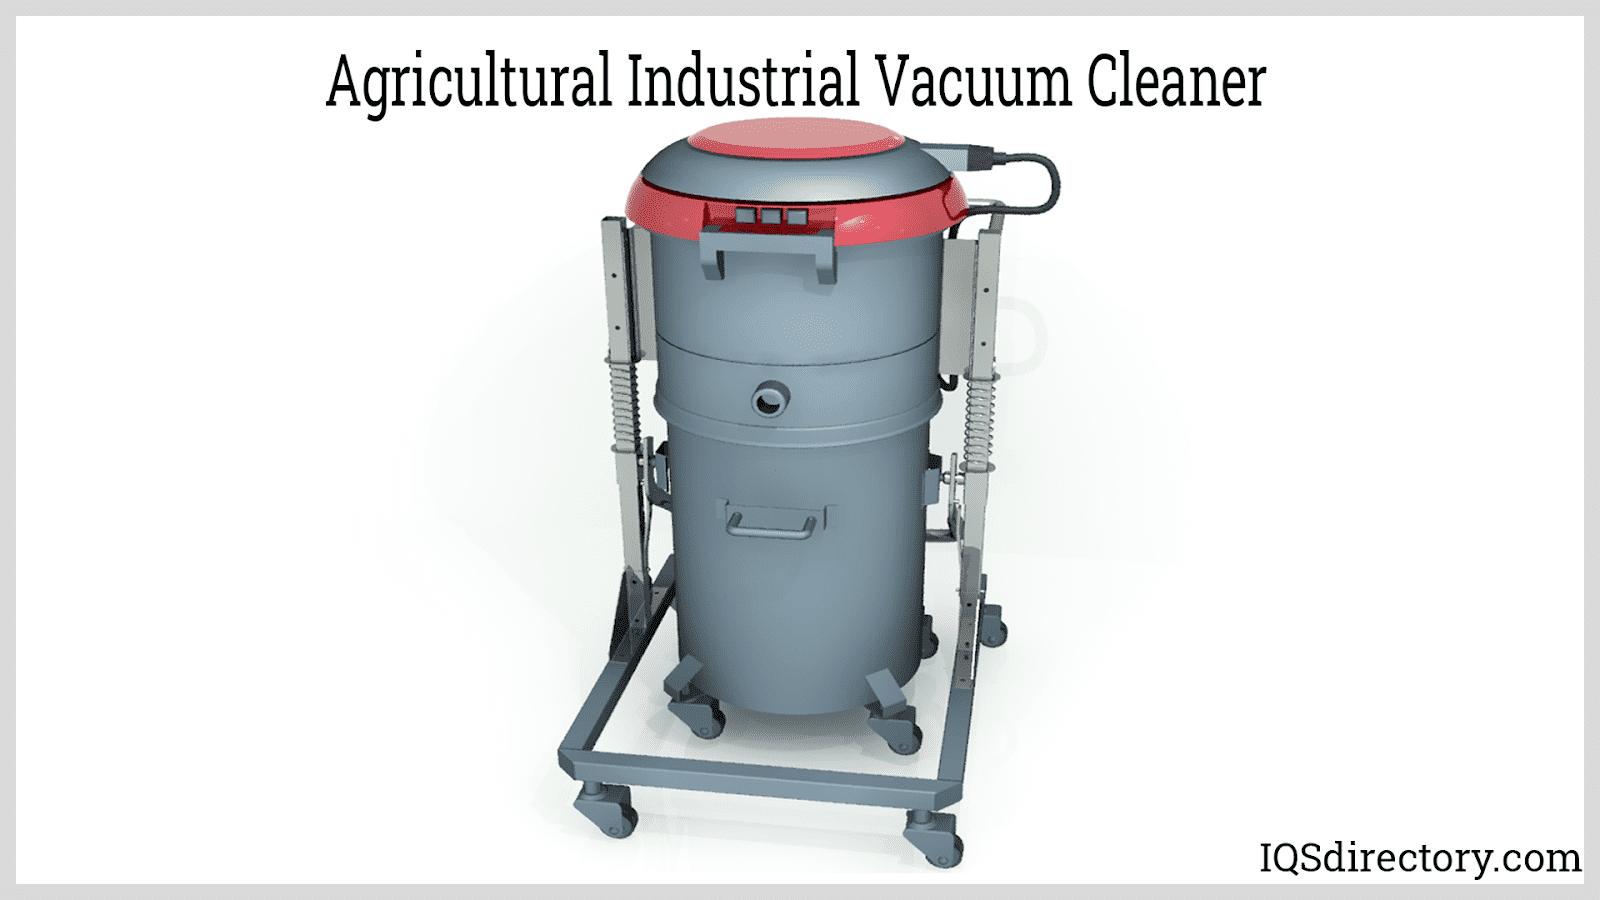 Agricultural Industrial Vacuum Cleaner